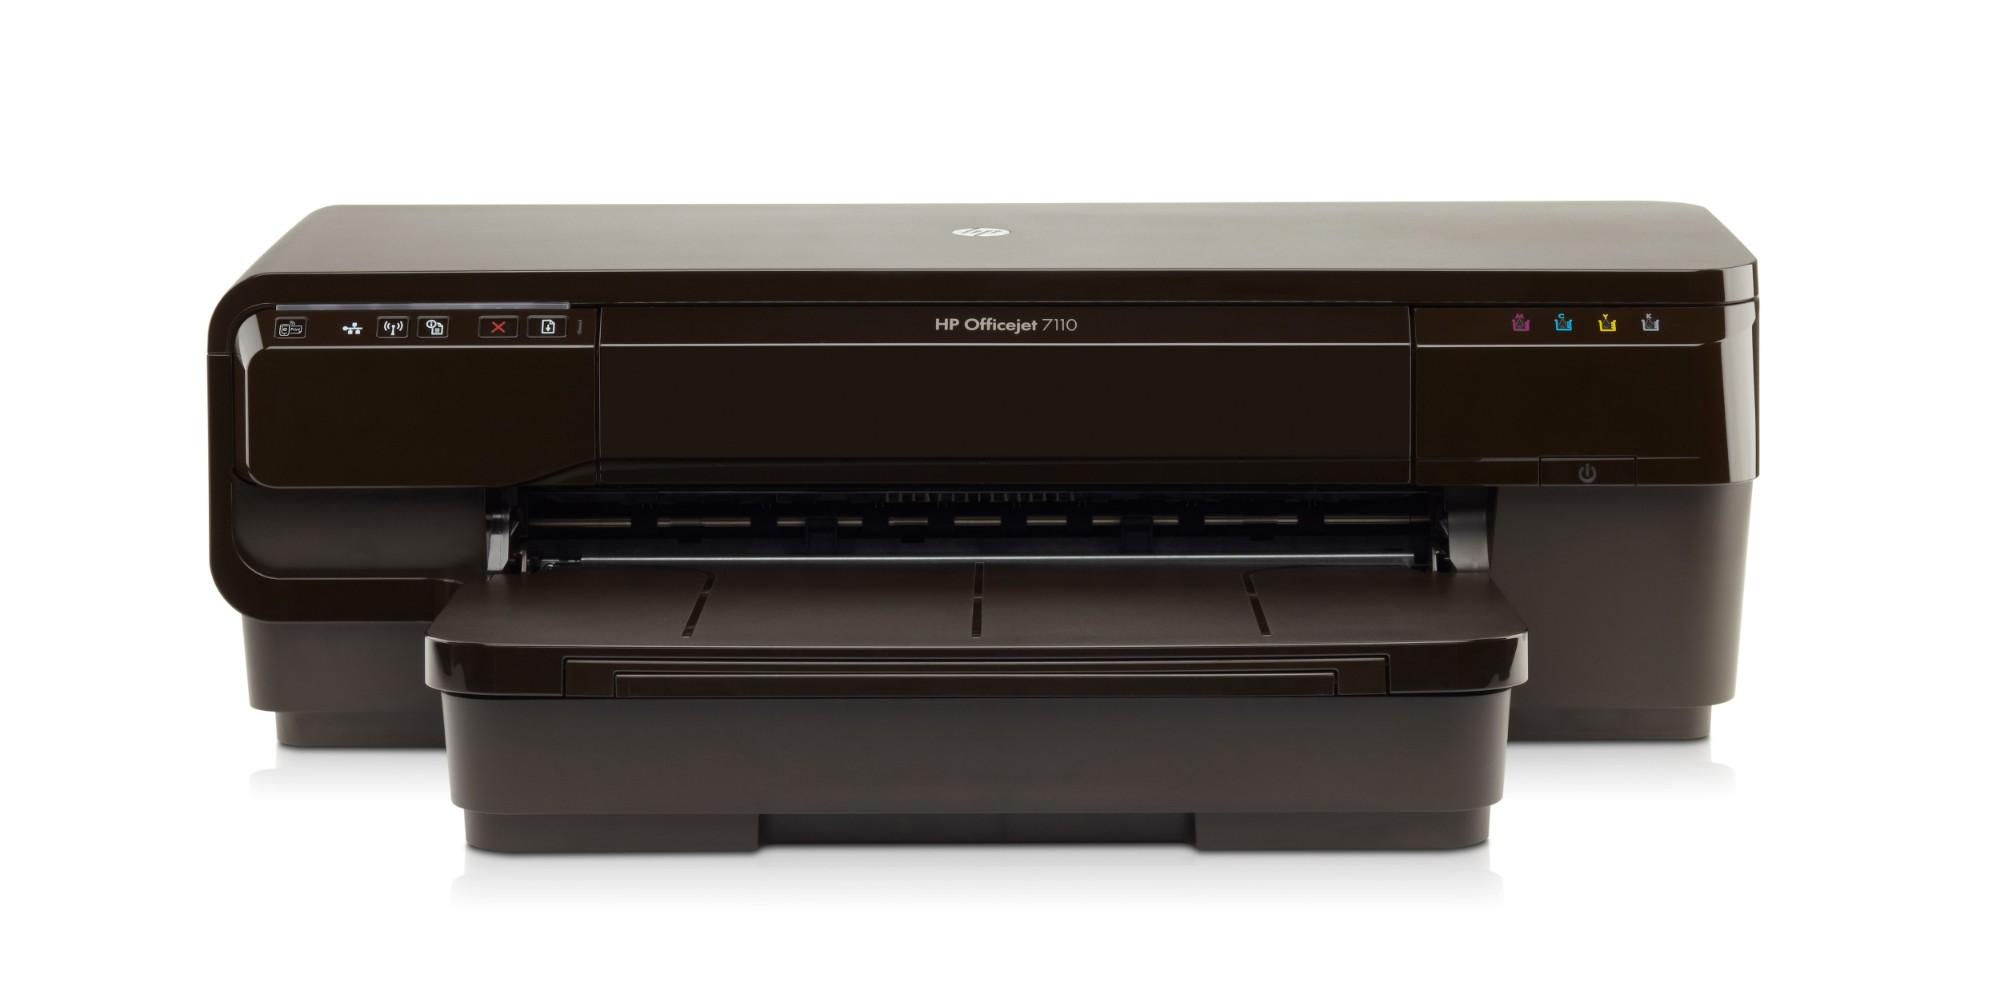 HP Officejet 7110 Wide Format ePrinter inkjet printer Colour 4800 x 1200 DPI A3 Wi-Fi